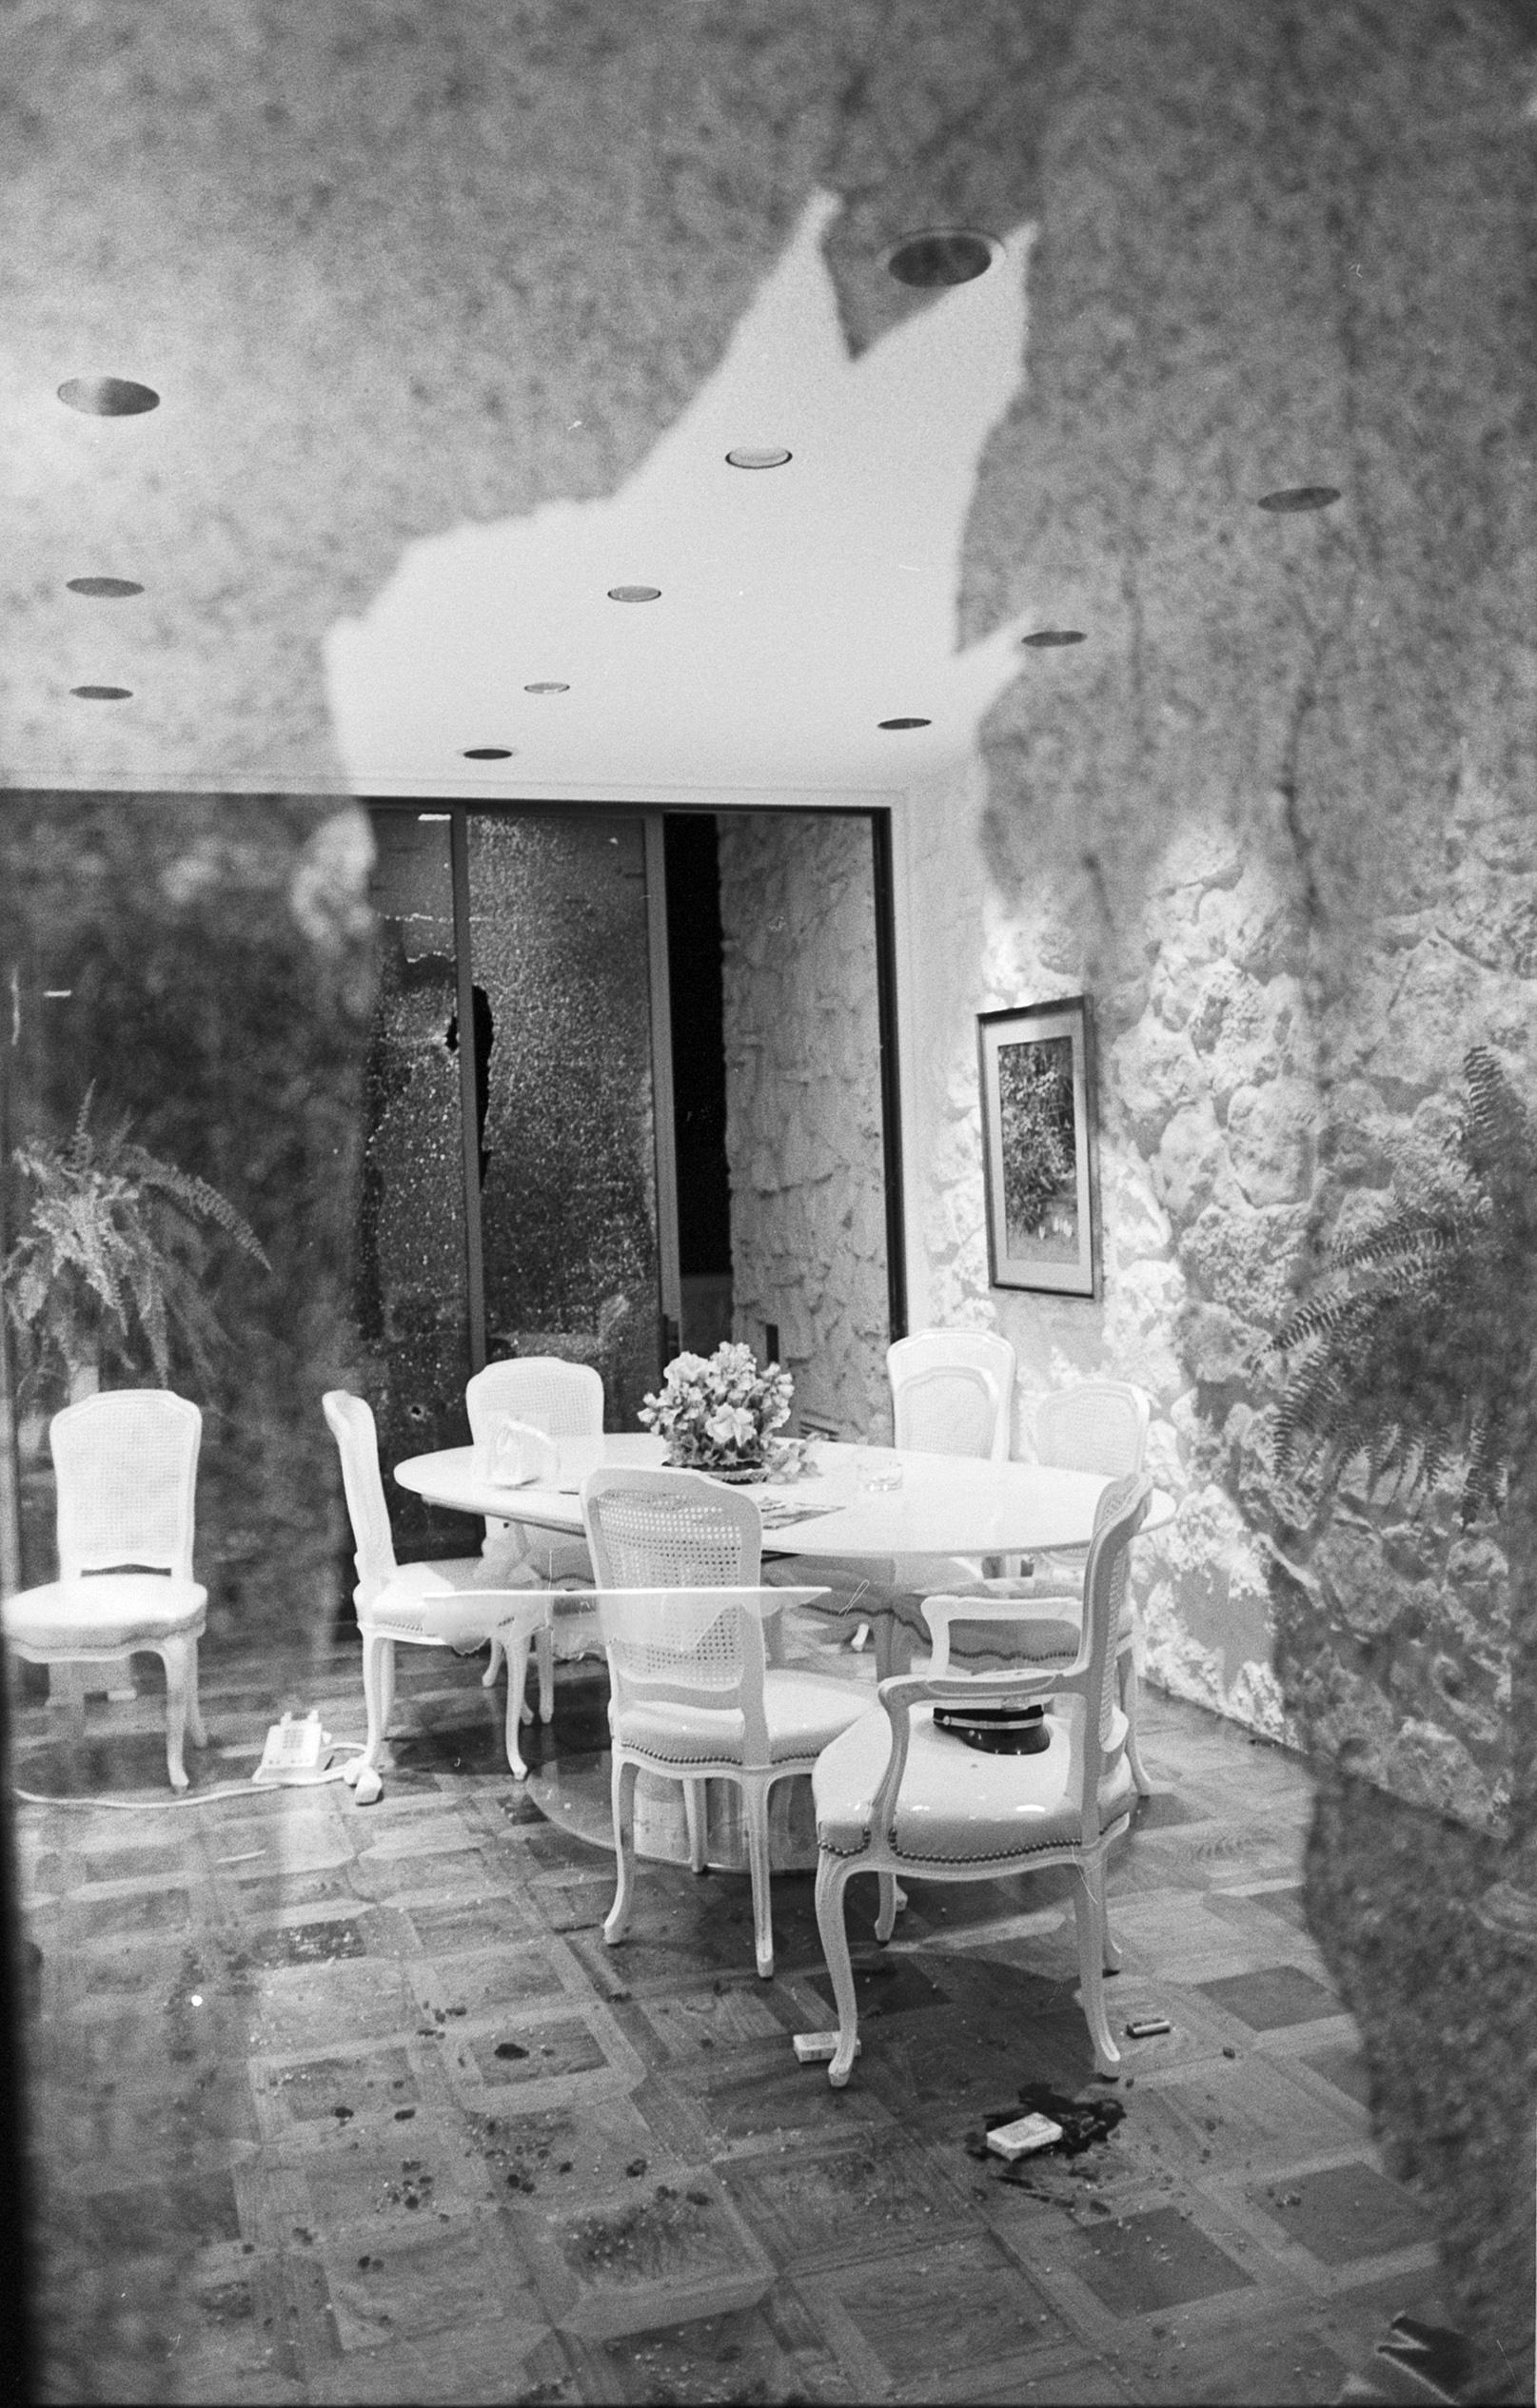 Broken Window In Dining Room Of Davis Mansion Uta Libraries Digital Gallery